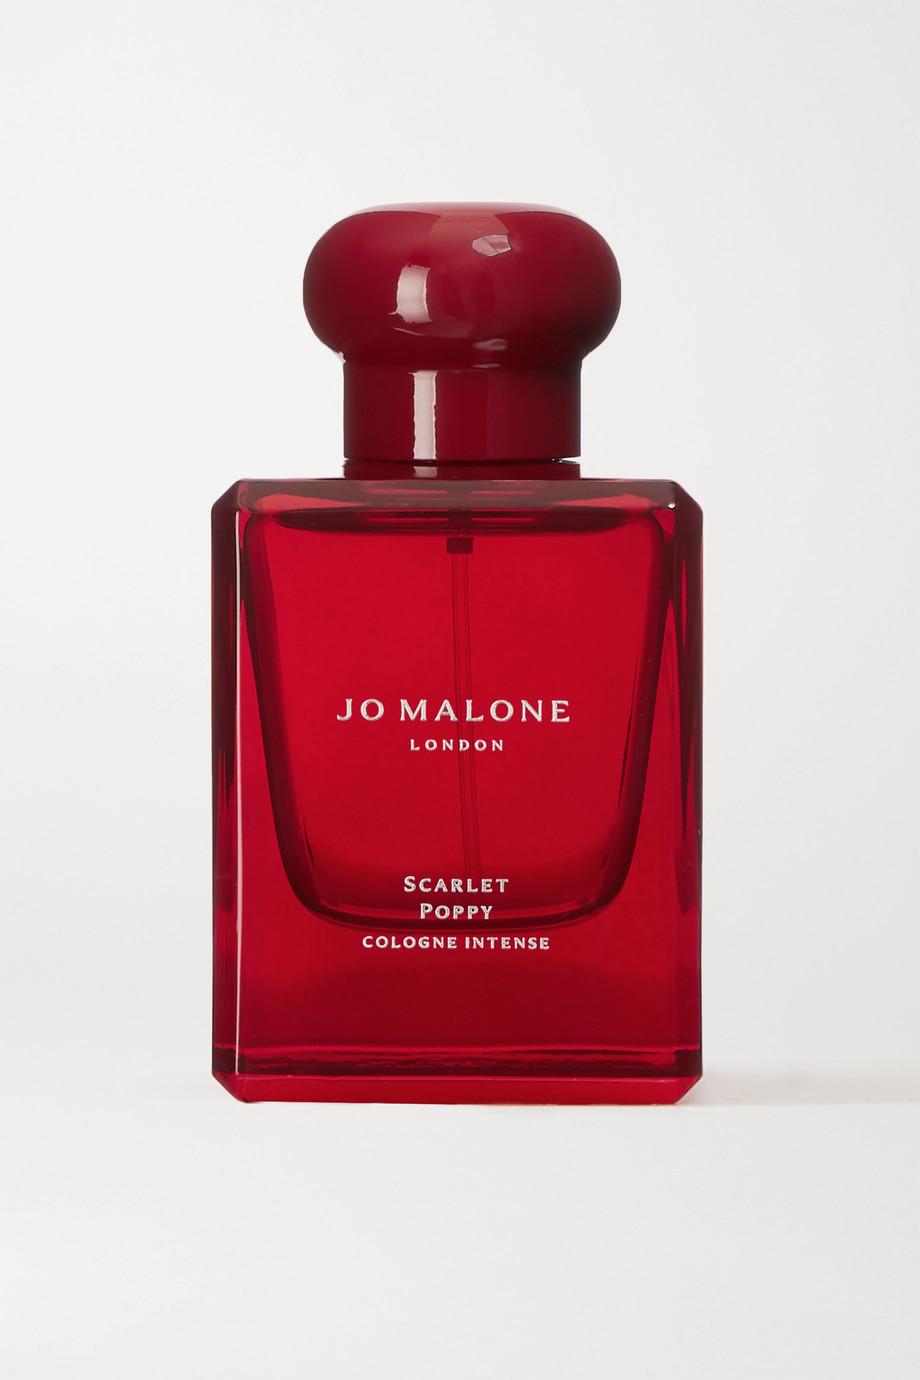 Jo Malone London Scarlet Poppy Cologne Intense, 50ml